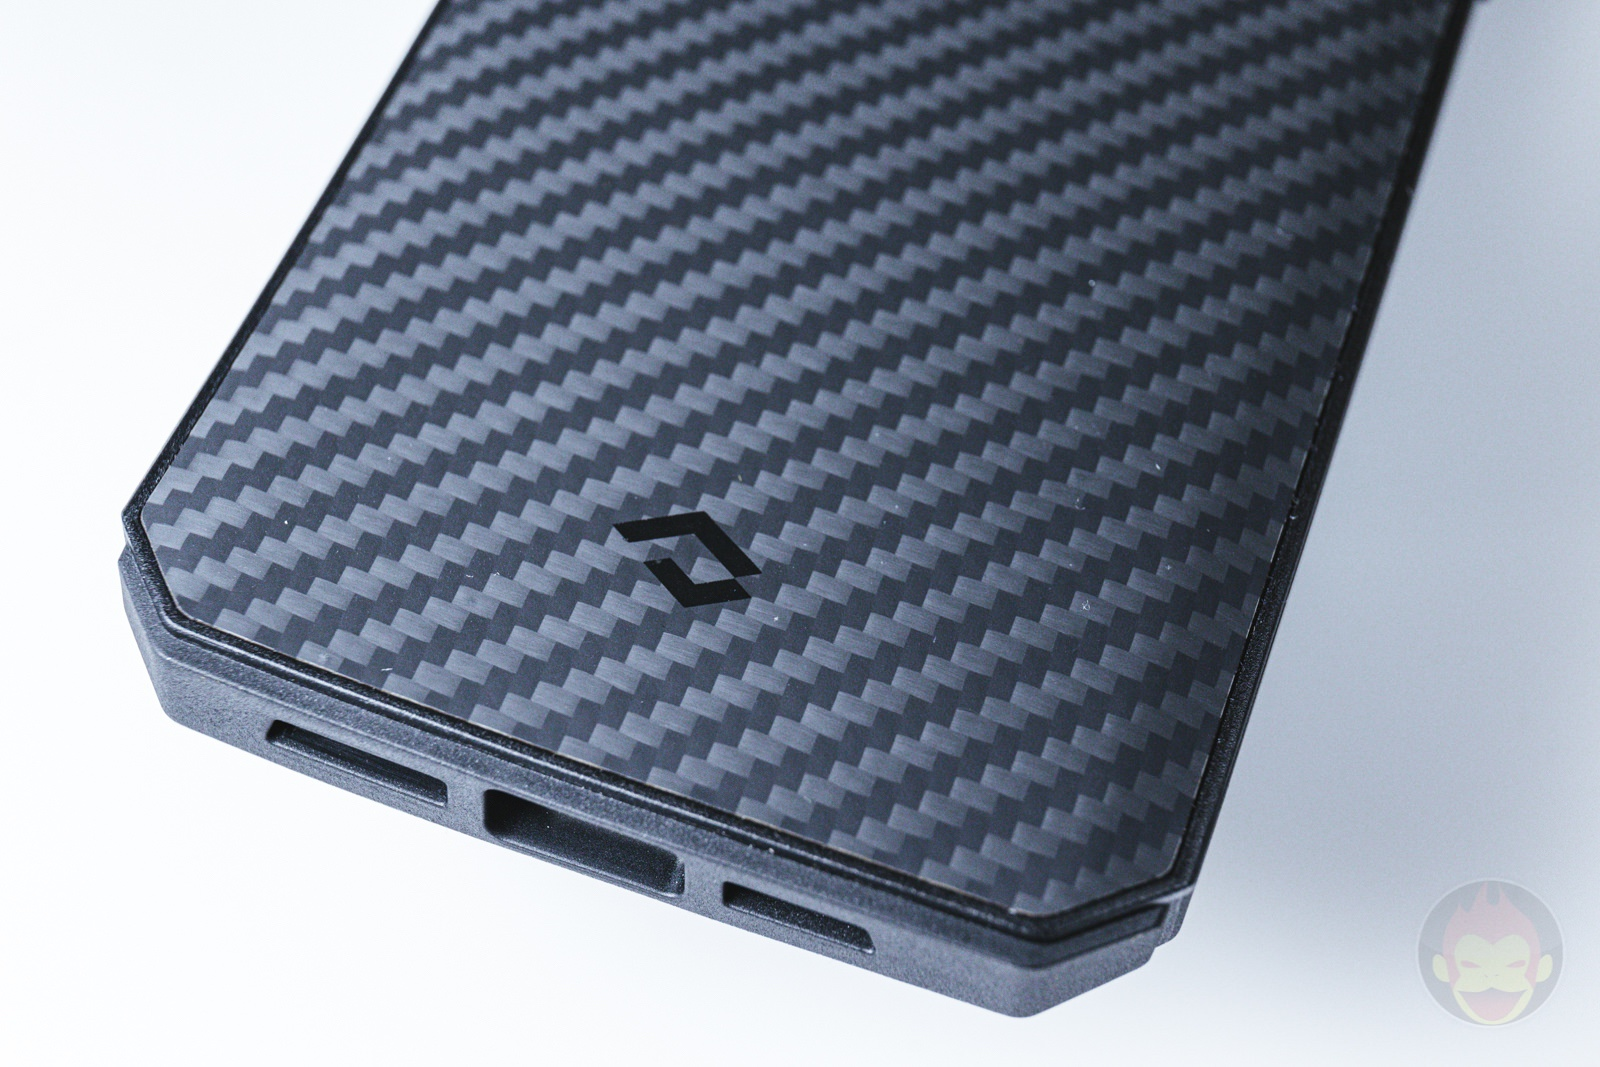 PITAKA-MagEZ-Case-Pro-Review-01.jpg